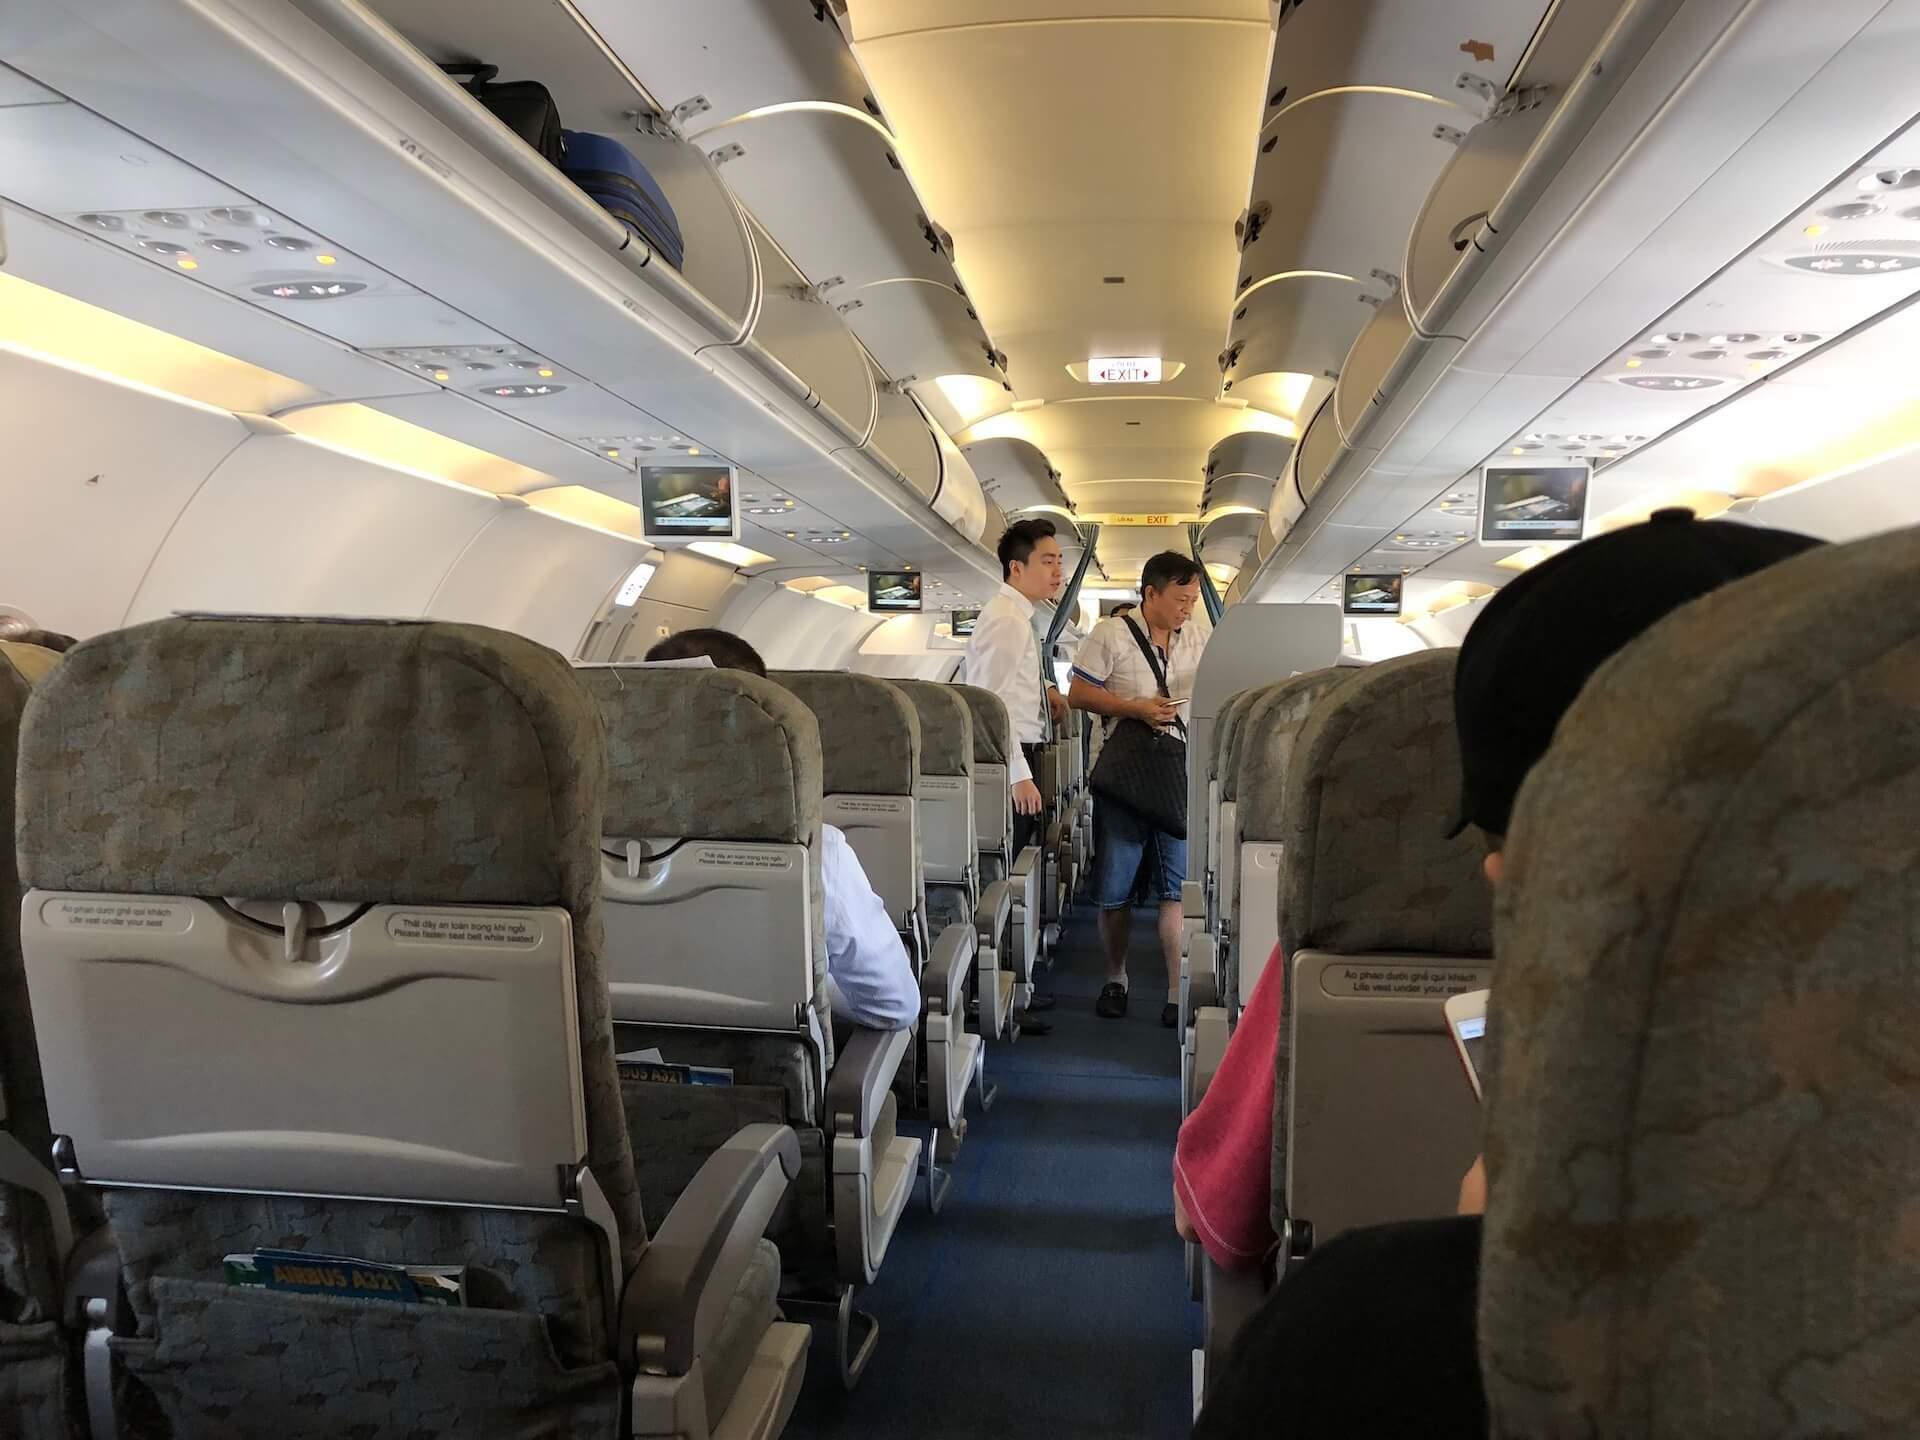 Vietnam Airlines Economy Class Airbus A321 Kabine